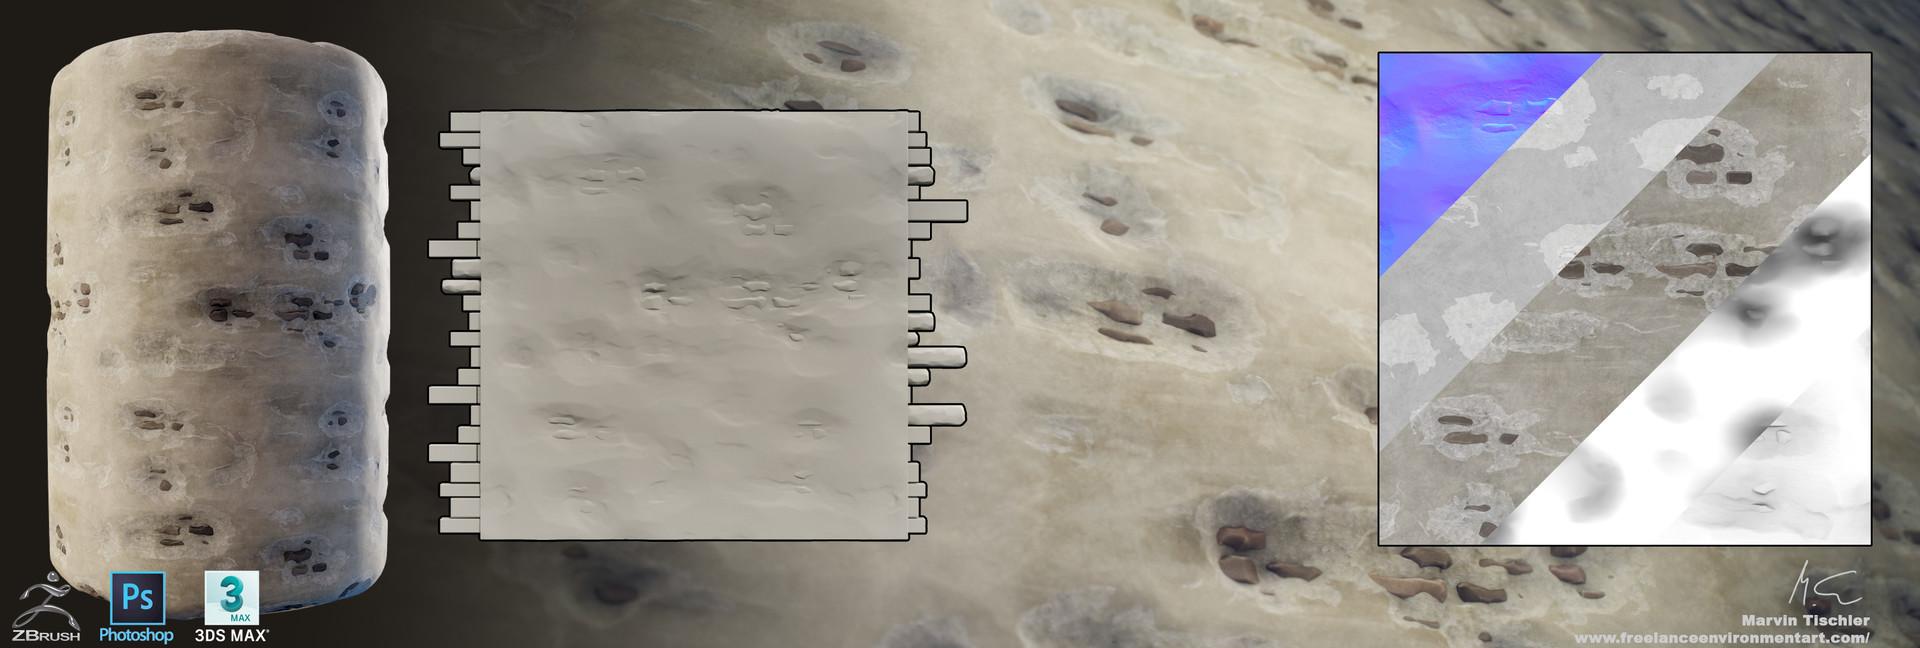 Marvin tischler handpainted textures 002 e